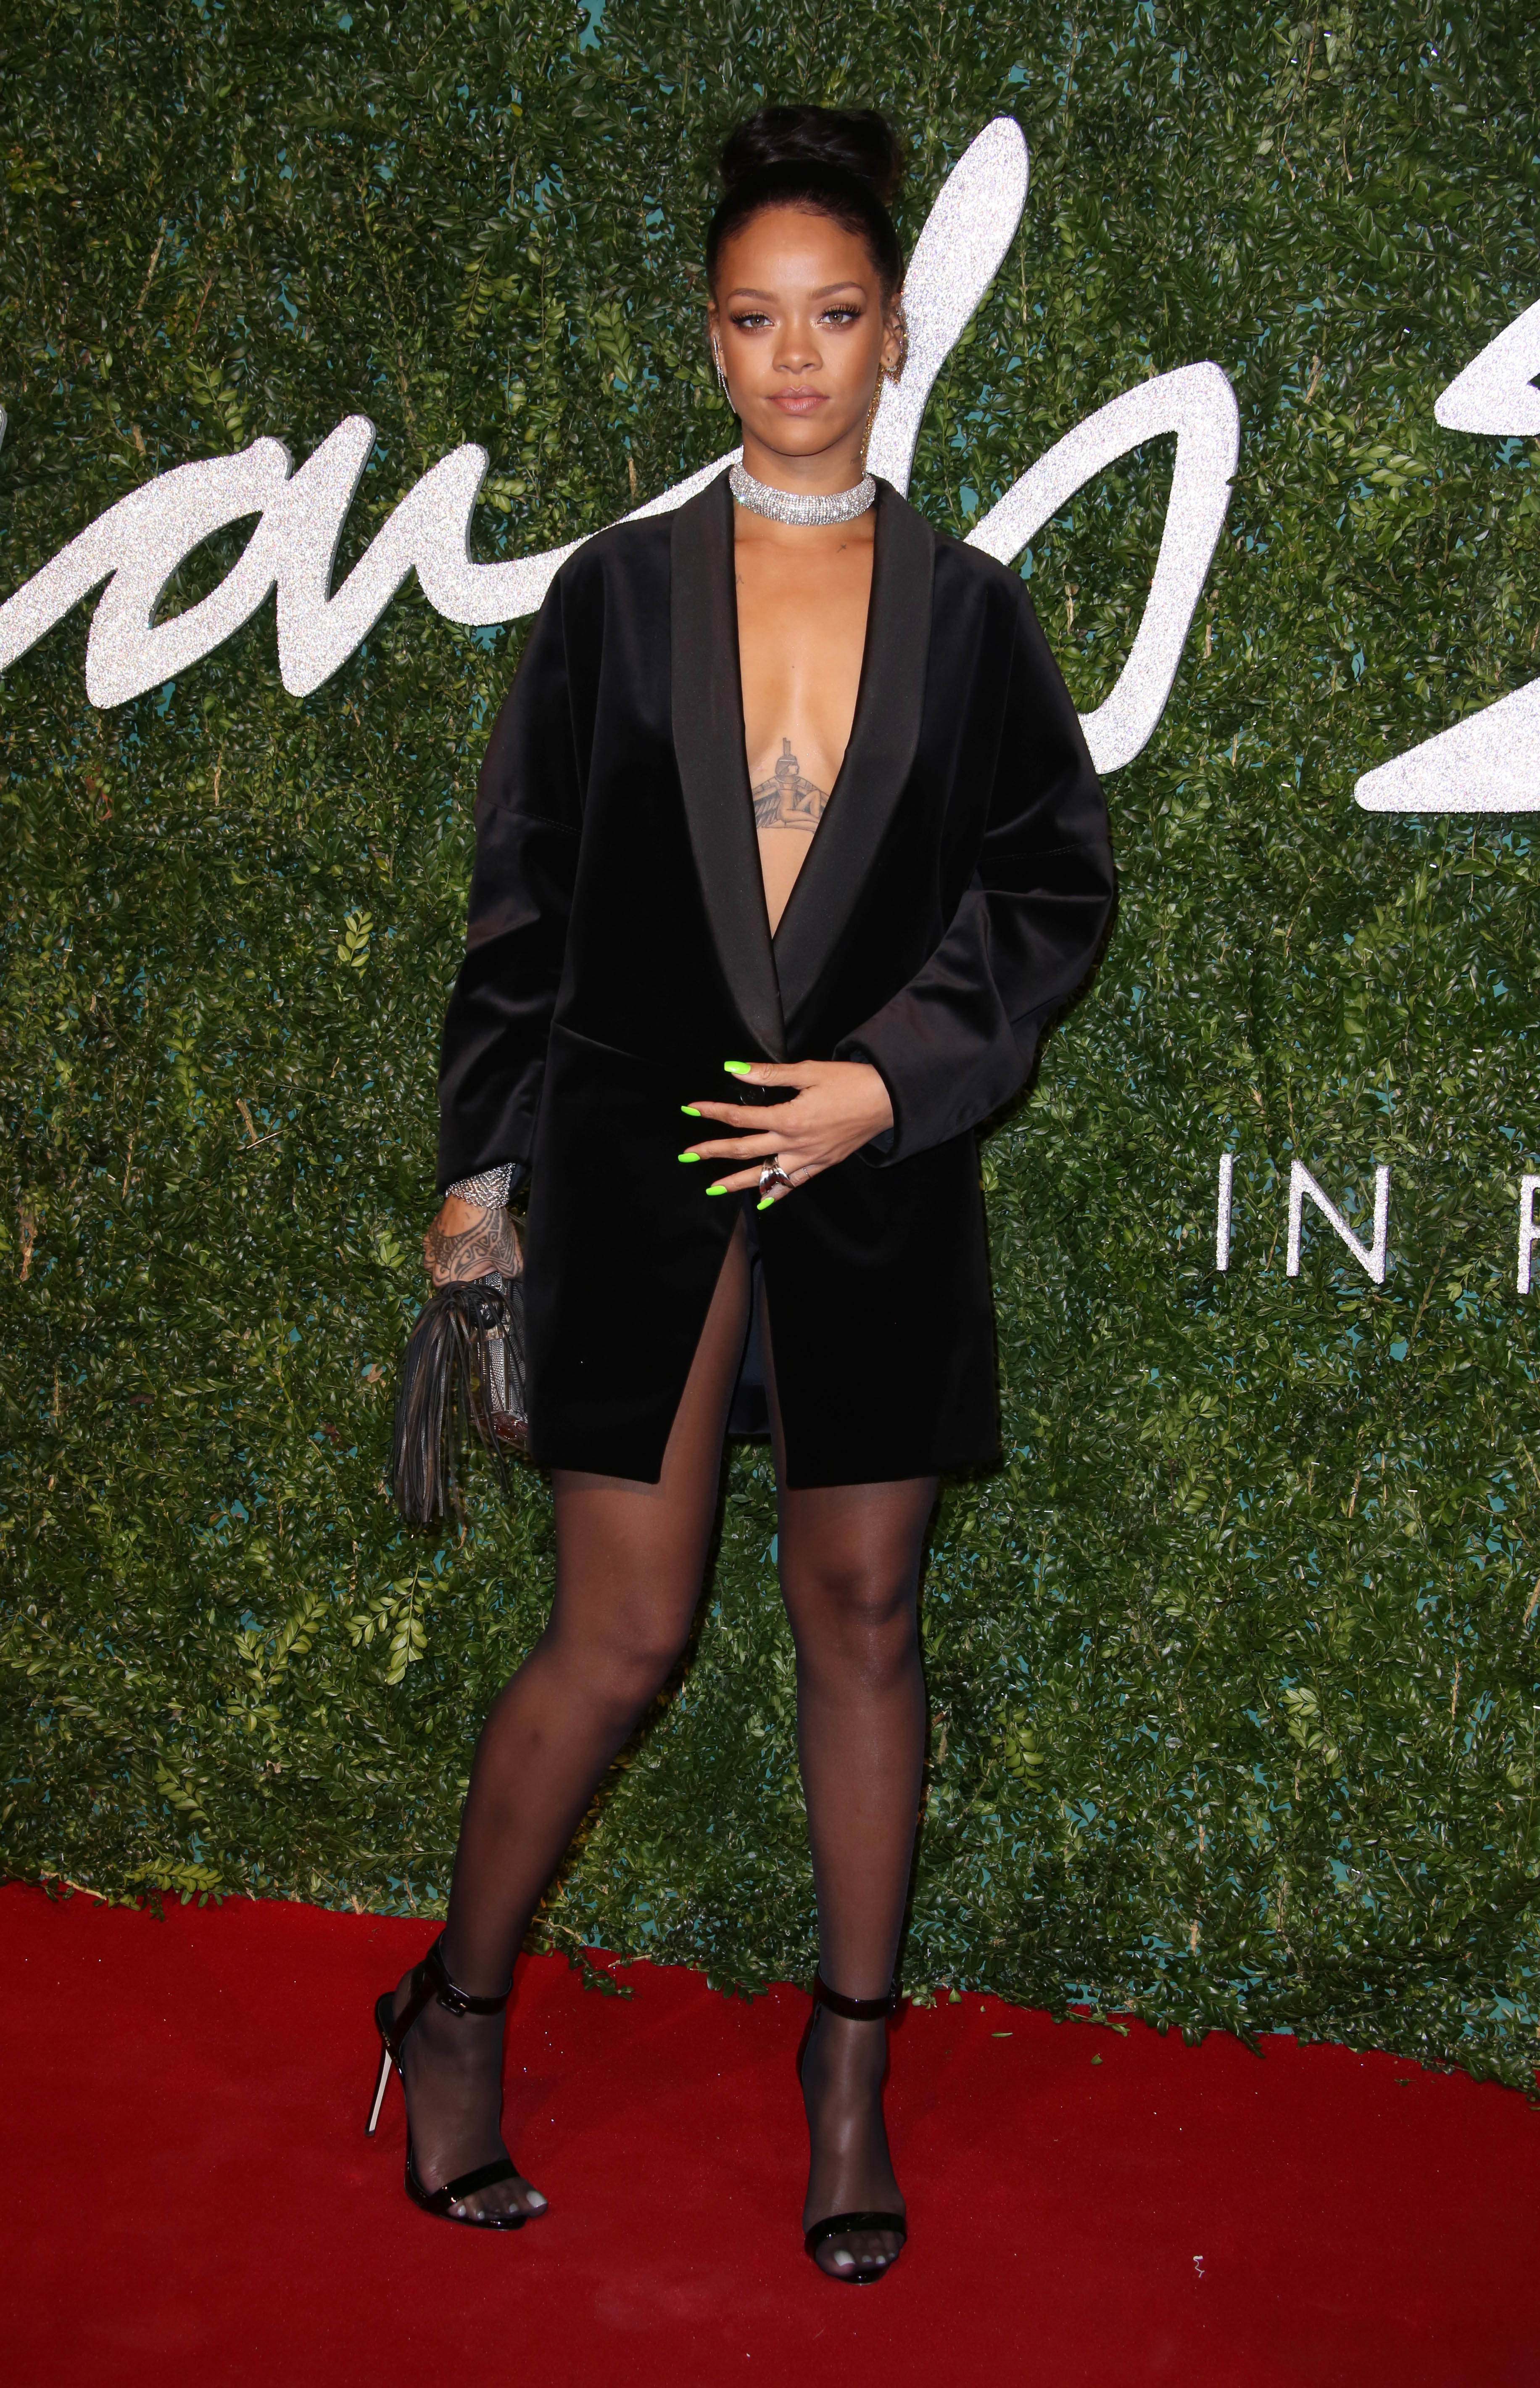 Rihanna no pants